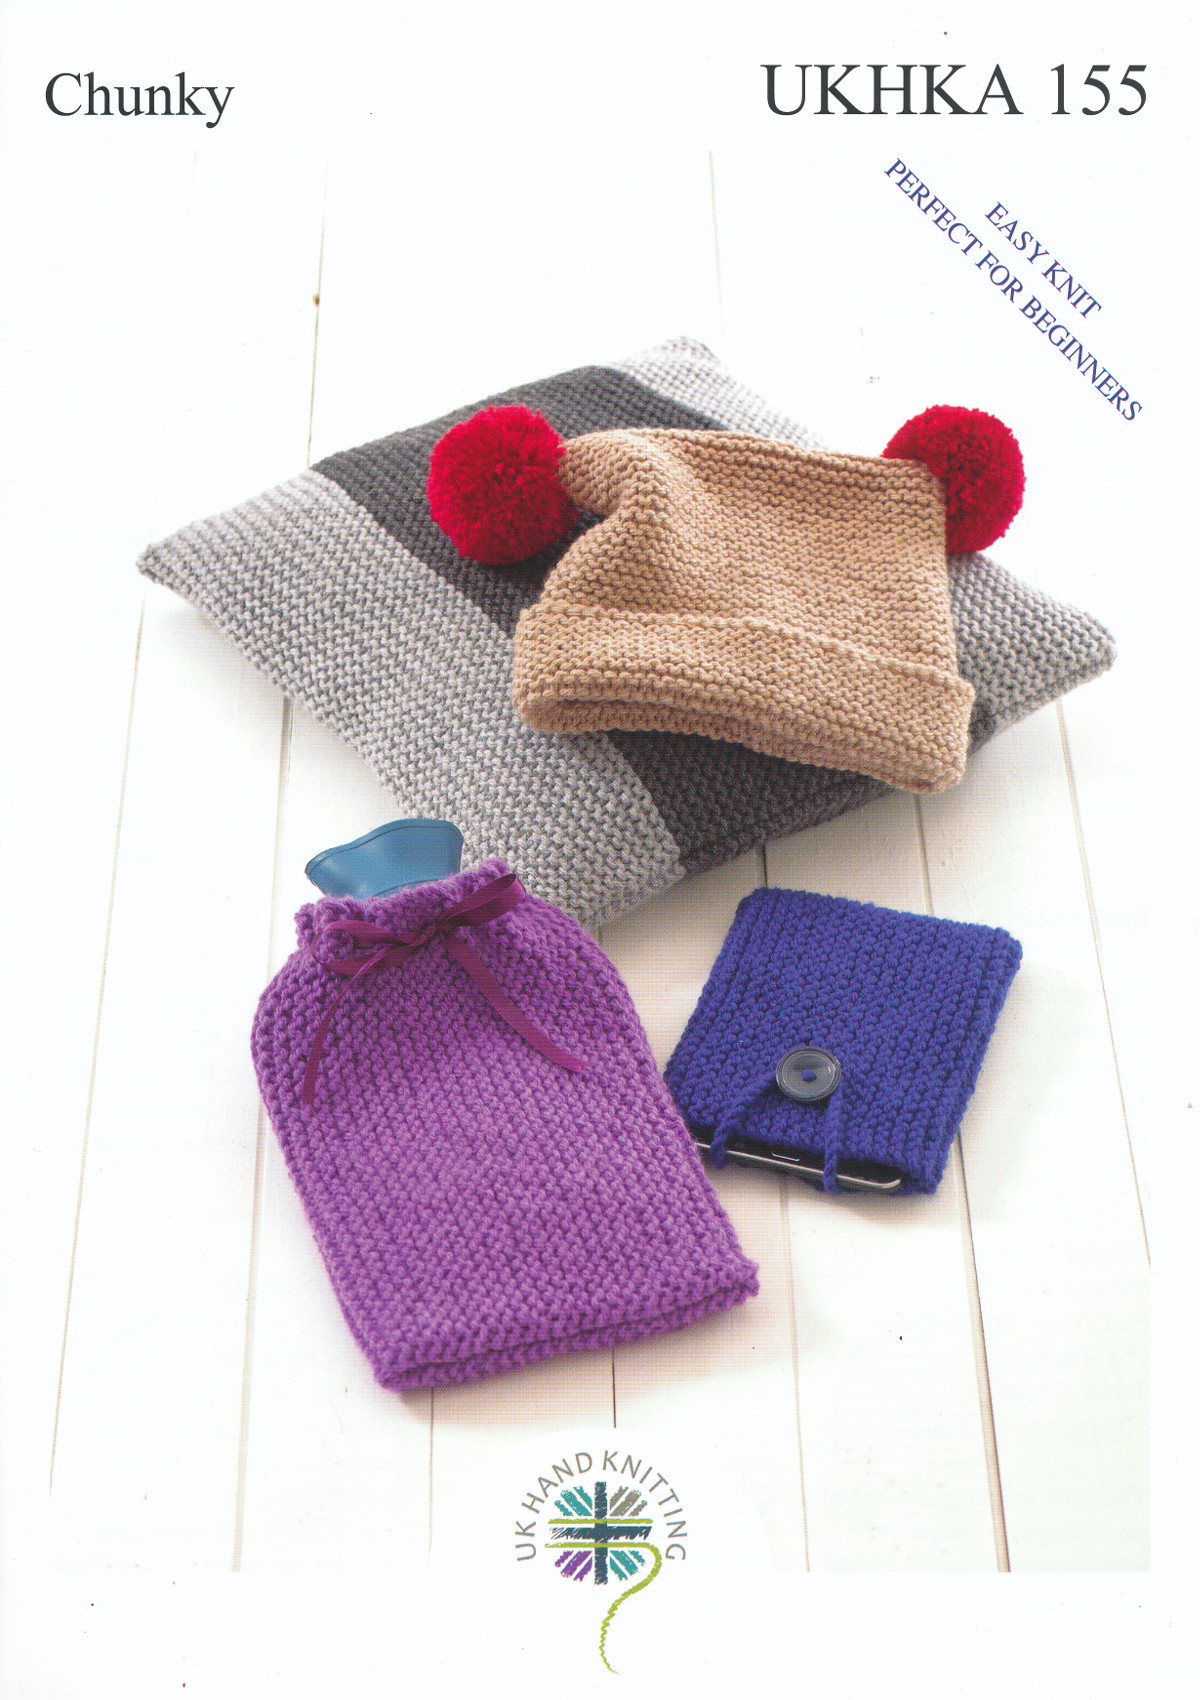 Easy knit hat cushion hot water bottle tablet covers knitting easy knit hat cushion hot water bottle tablet covers knitting pattern ukhka 155 dt1010fo